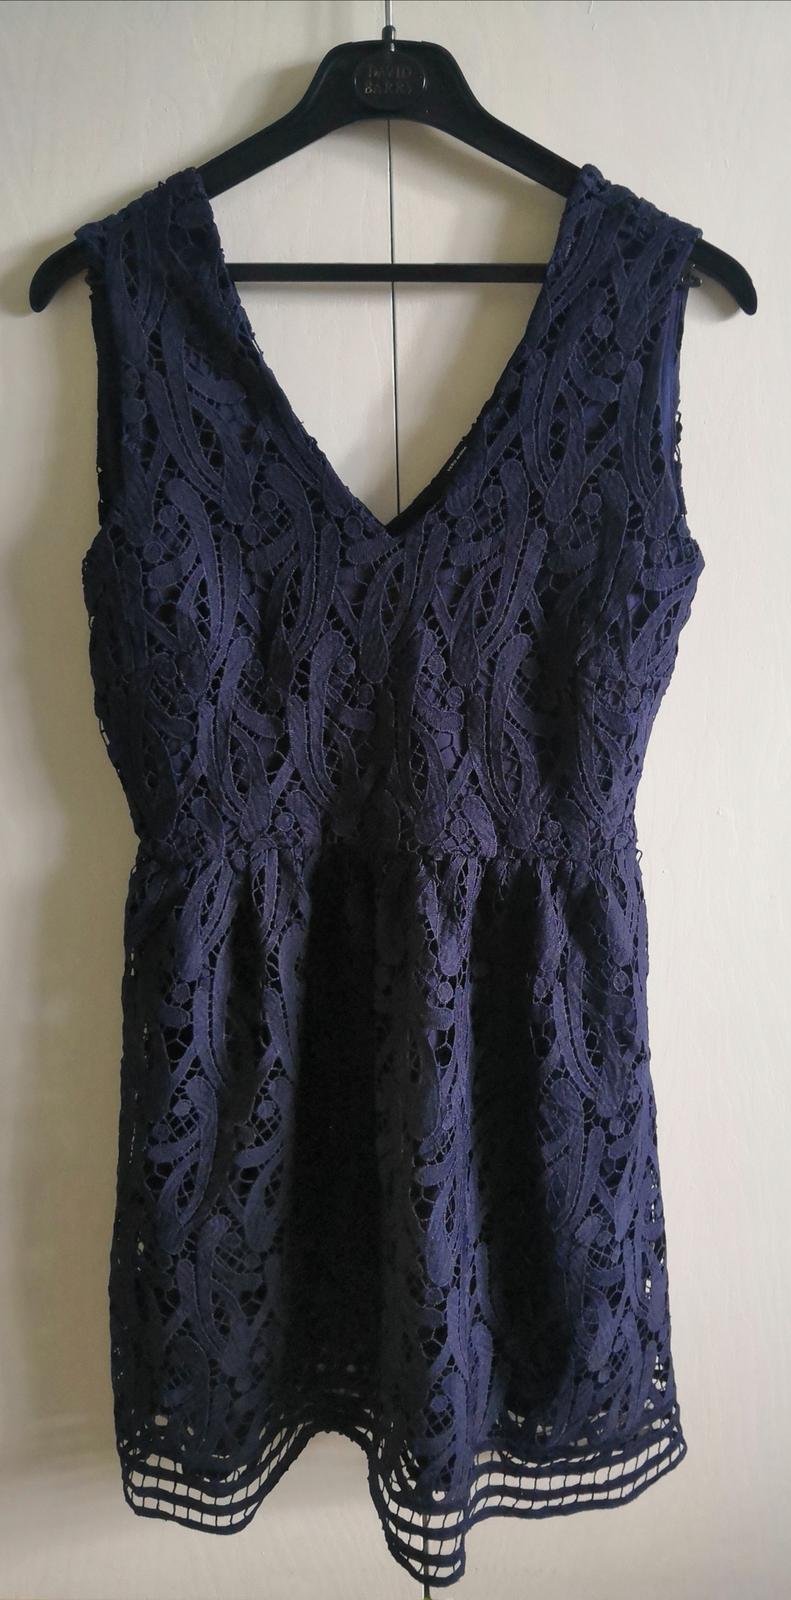 Tmavomodré čipkované šaty - Obrázok č. 2